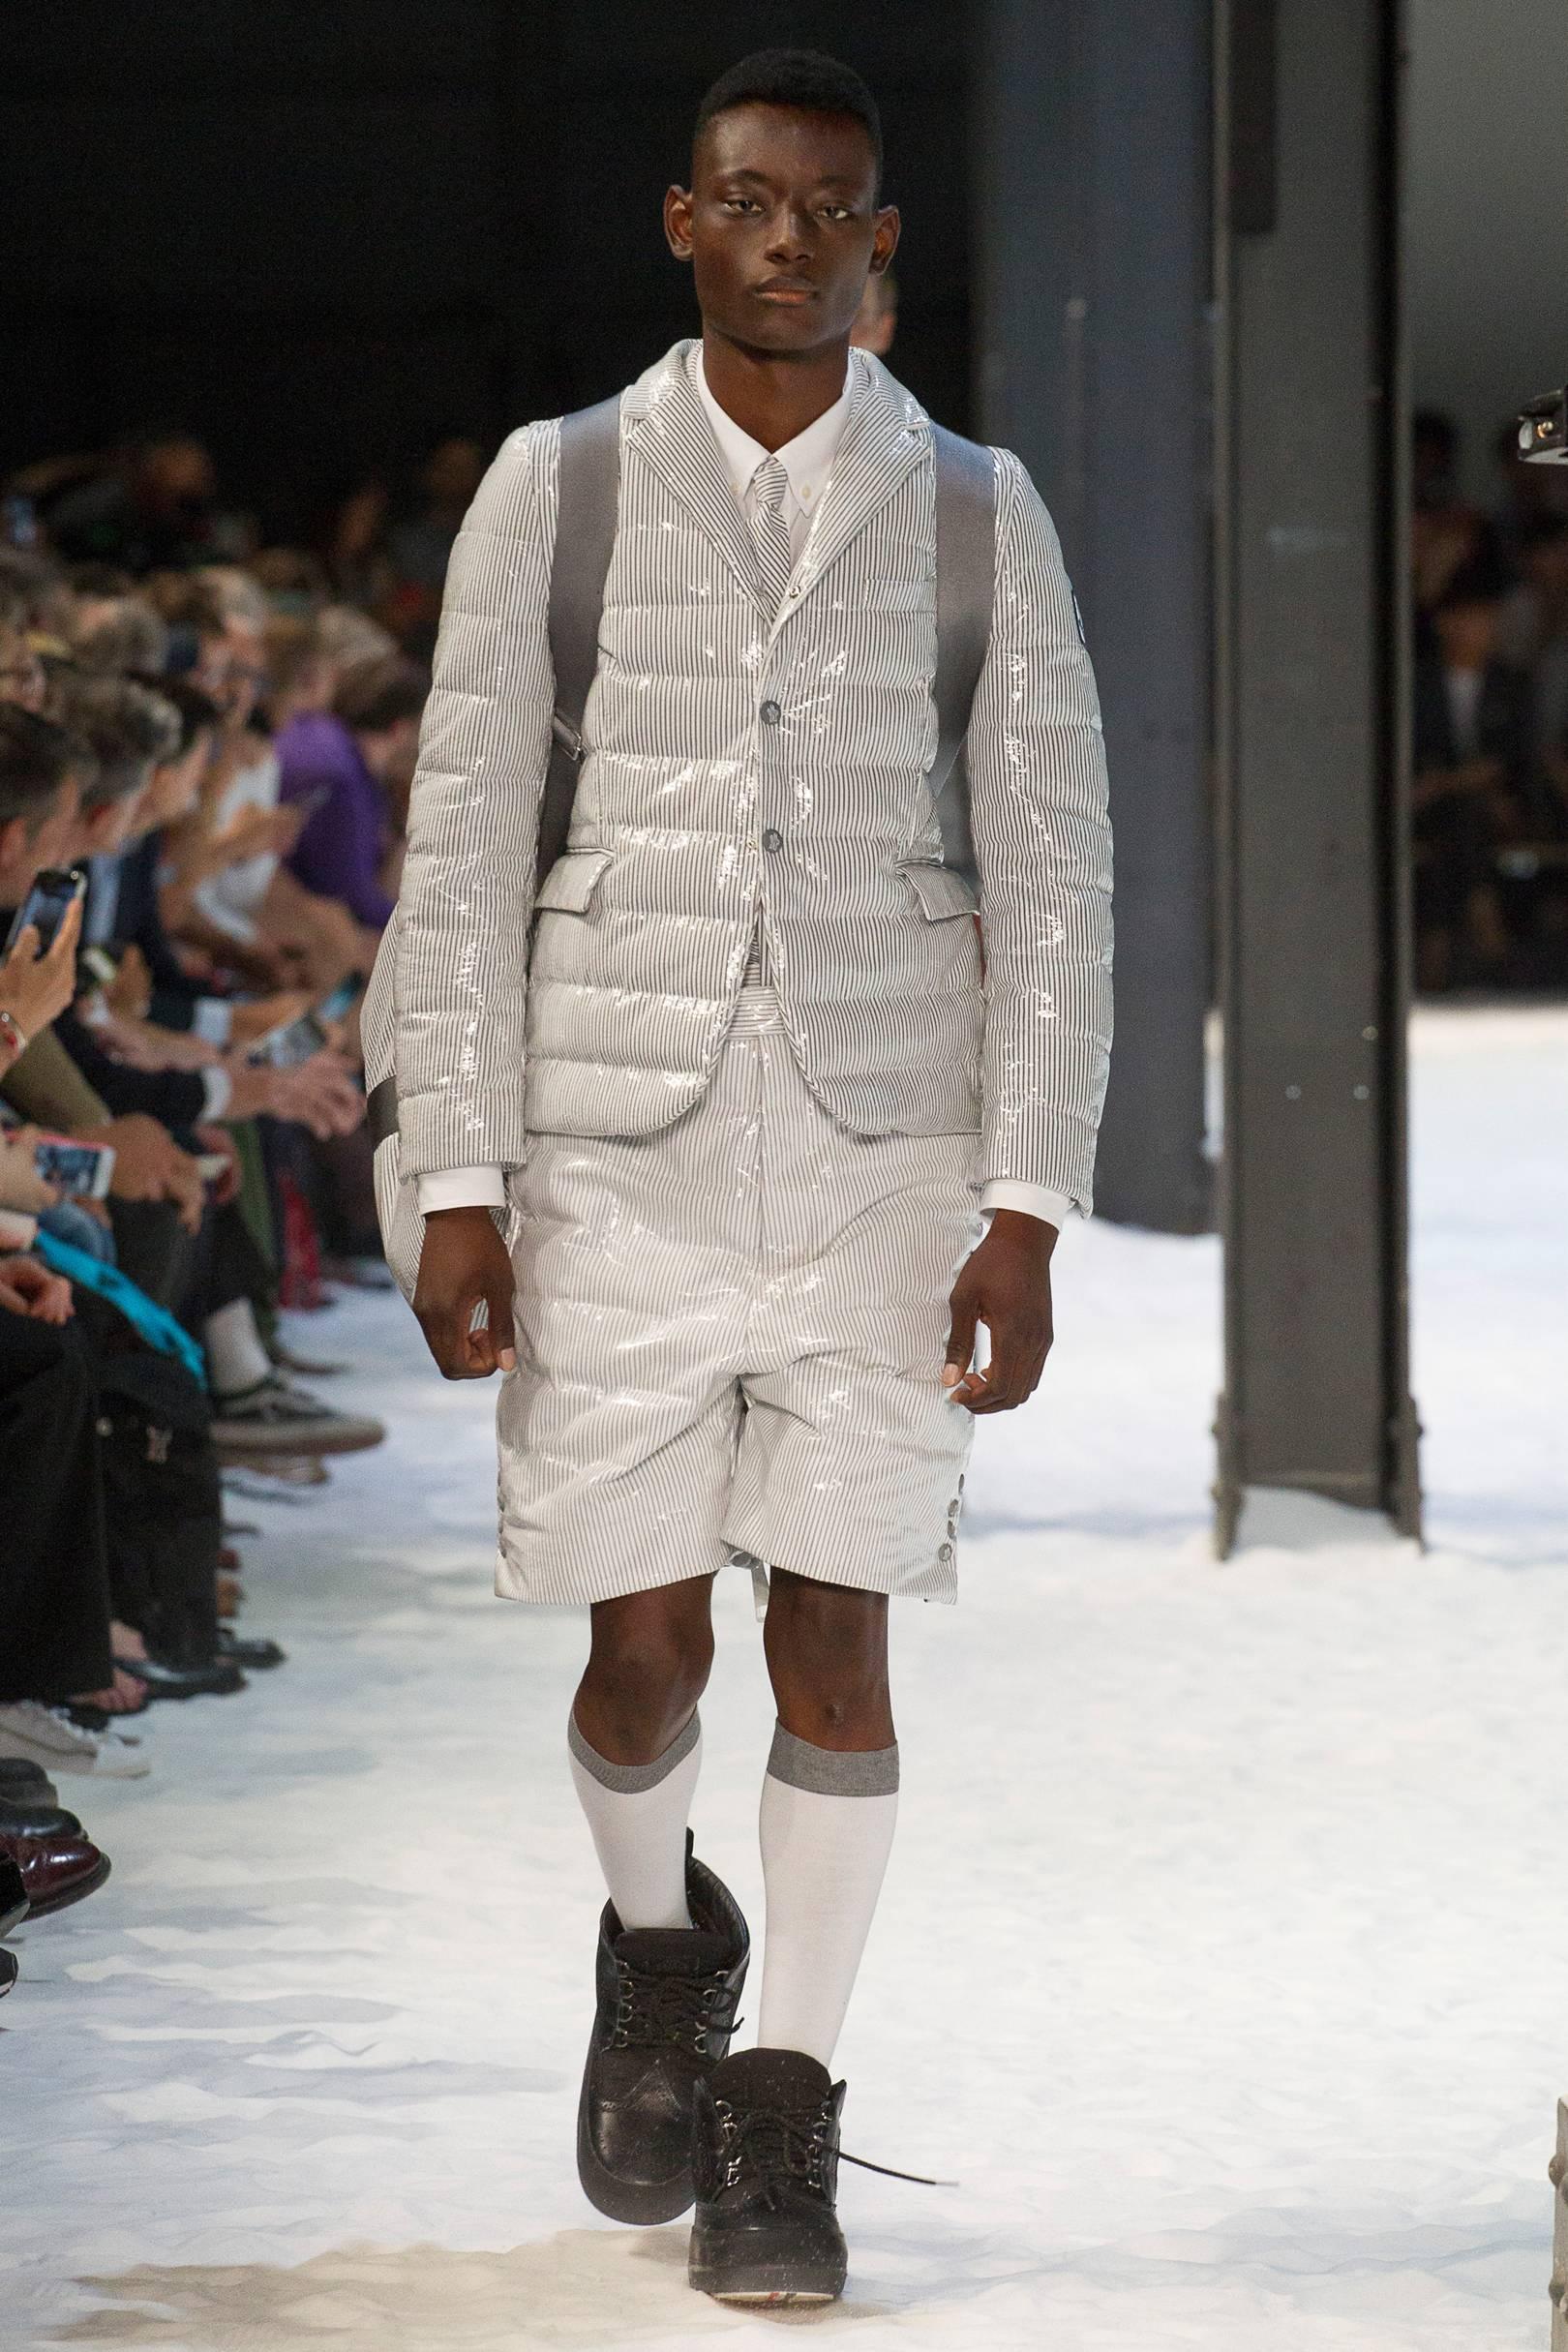 Mens stylish waterproof coats